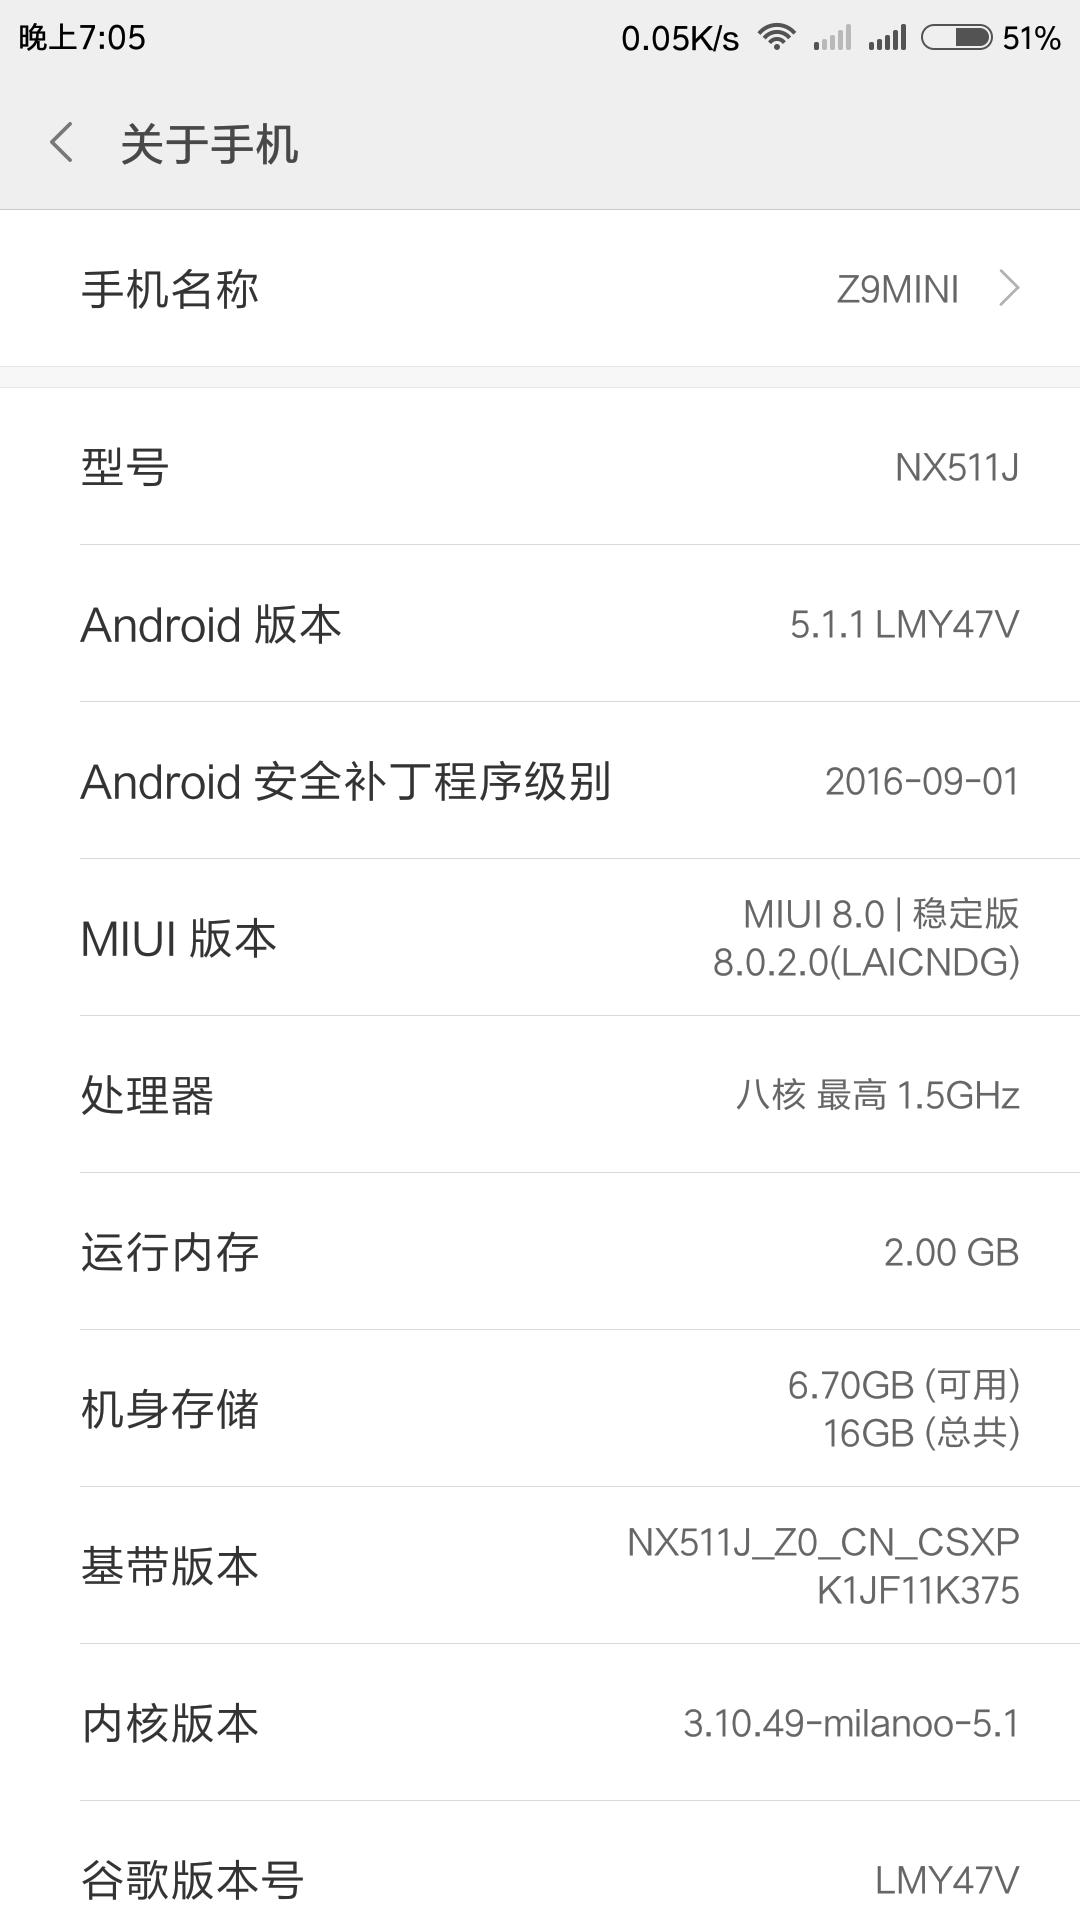 Screenshot_2017-03-05-19-05-42-586_com.android.se.png